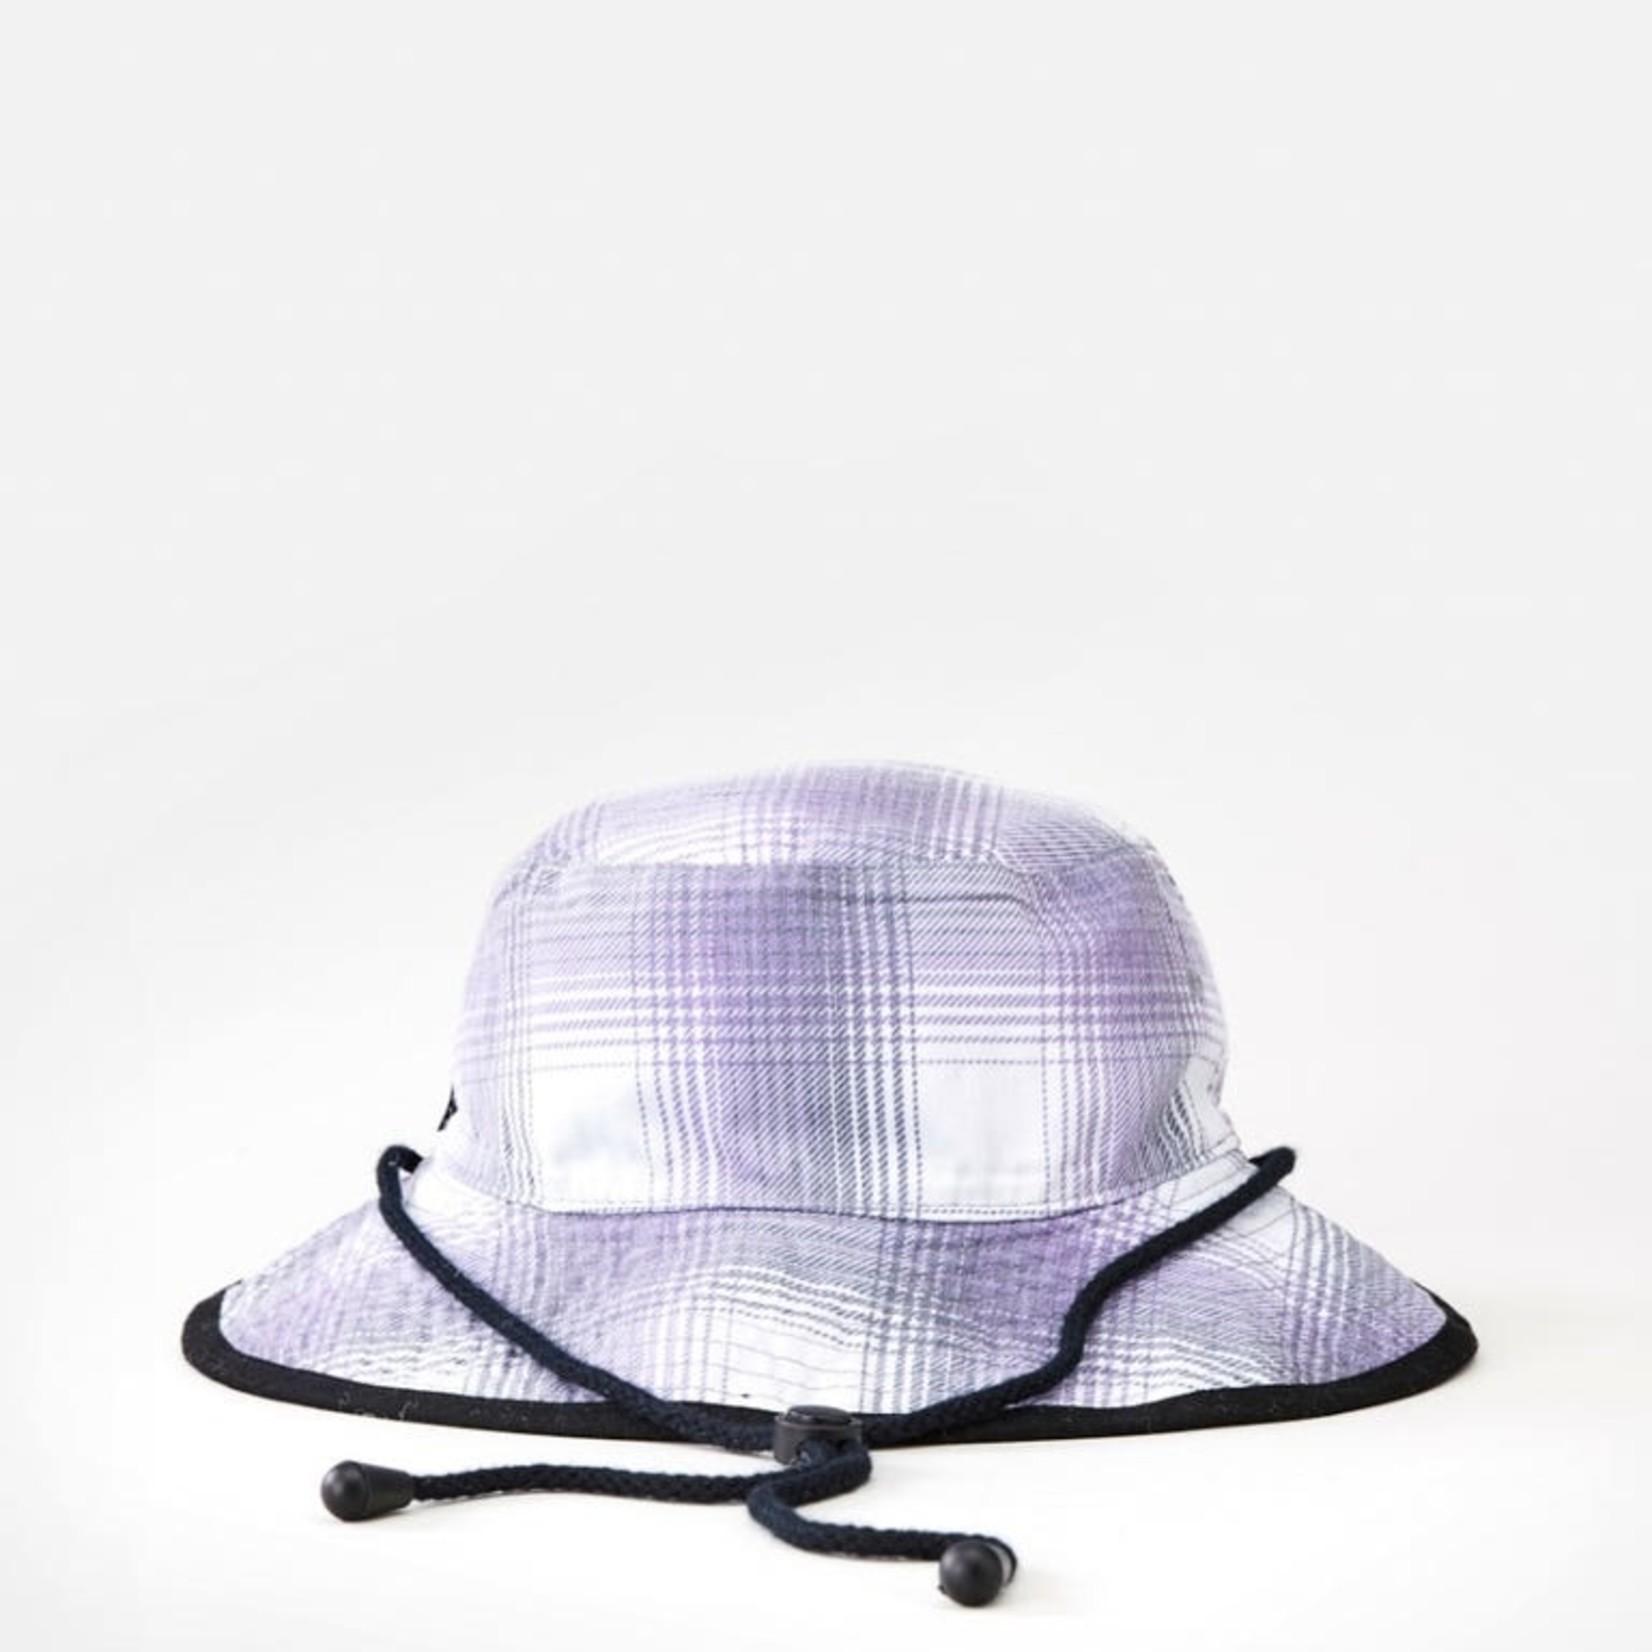 RipCurl Rip Curl Revo Valley Mid Brim Hat